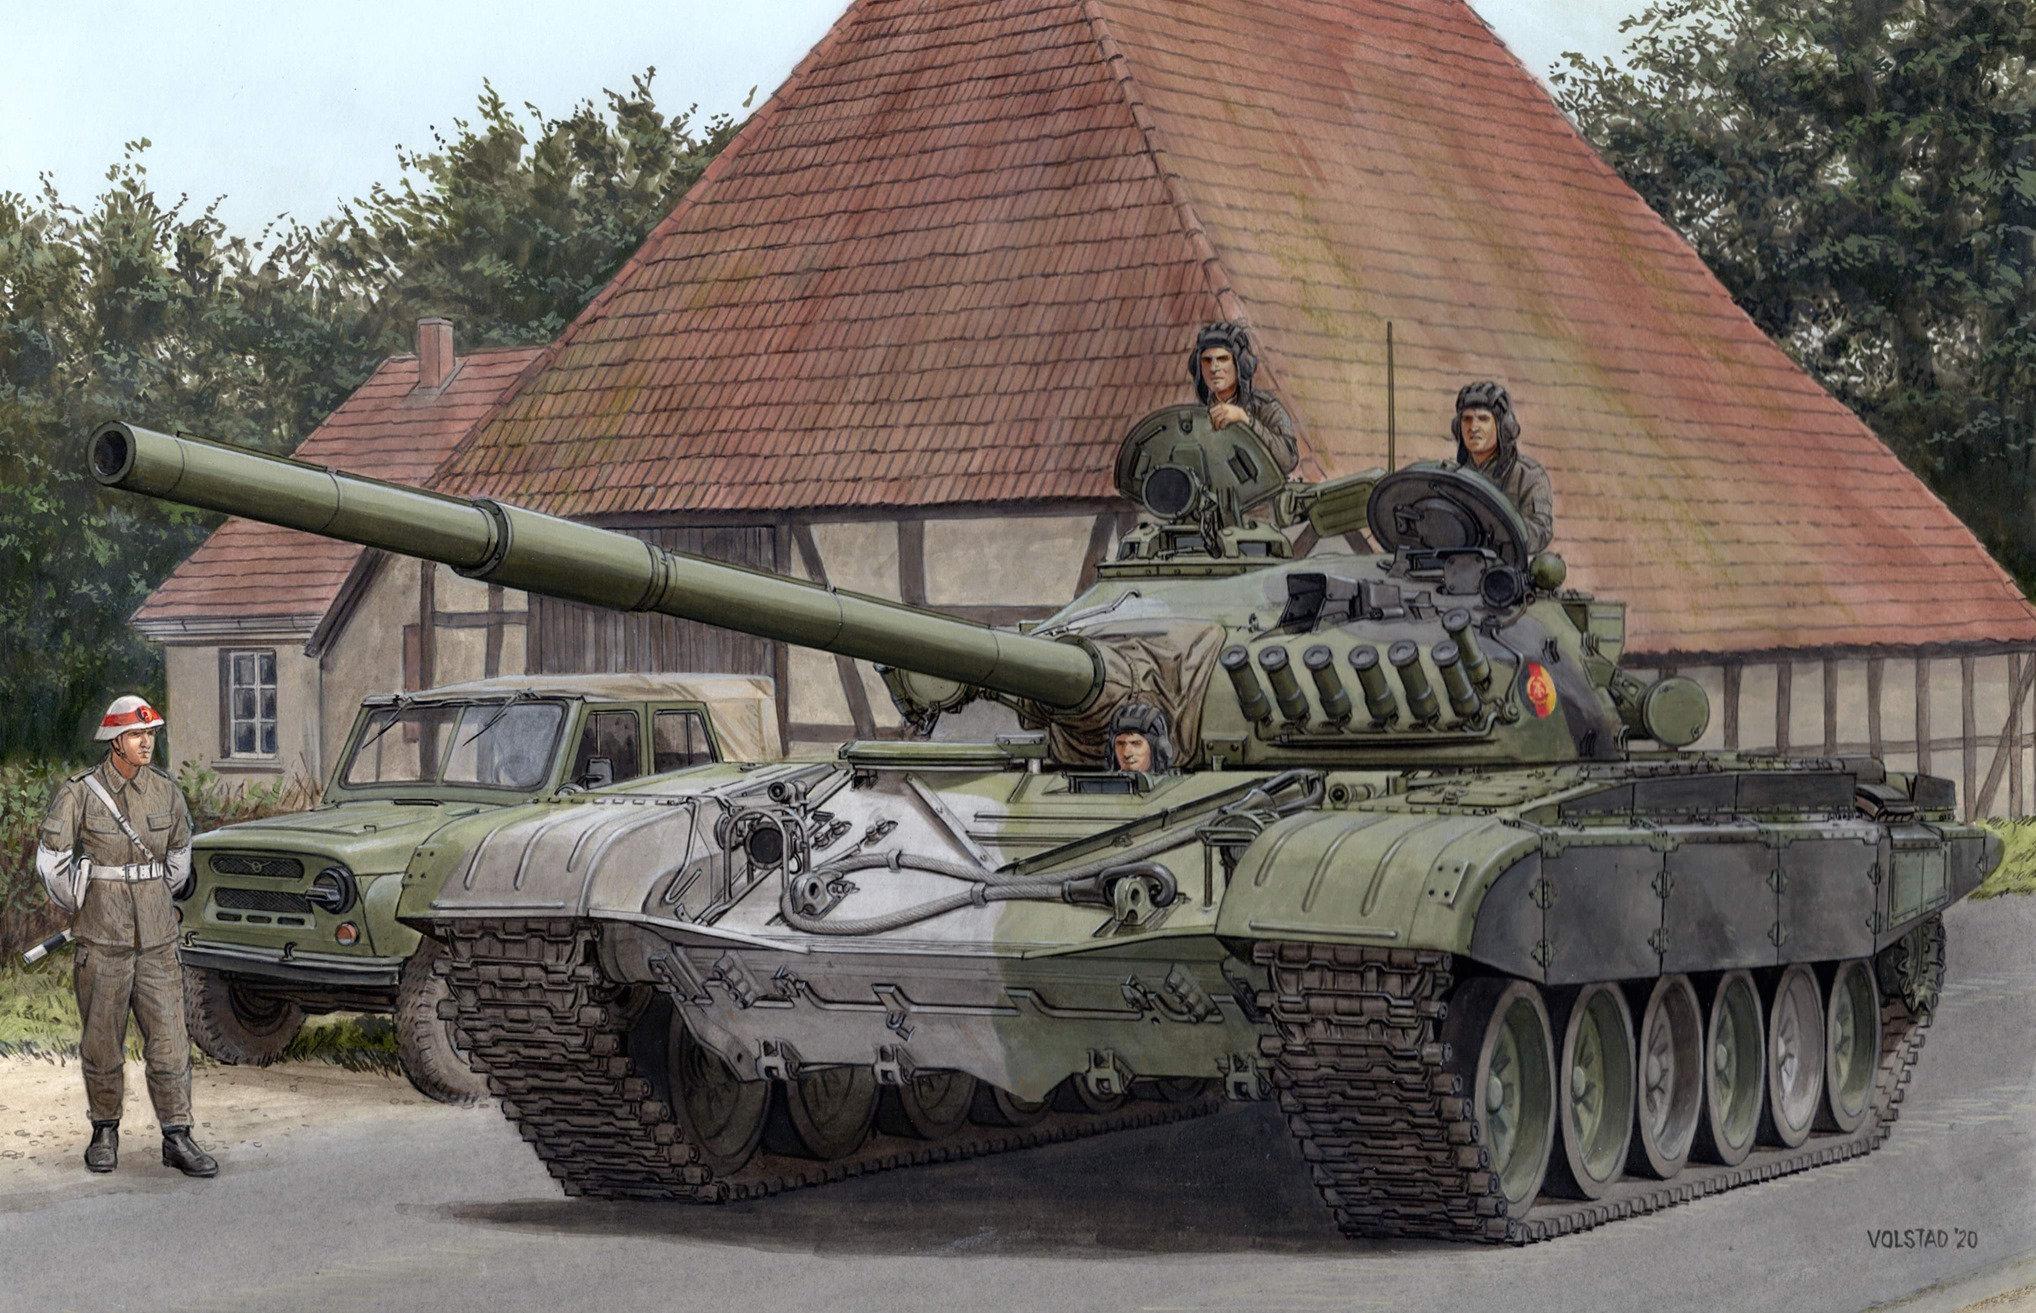 Amusing Hobby 1/35 T 72-M1 Tank